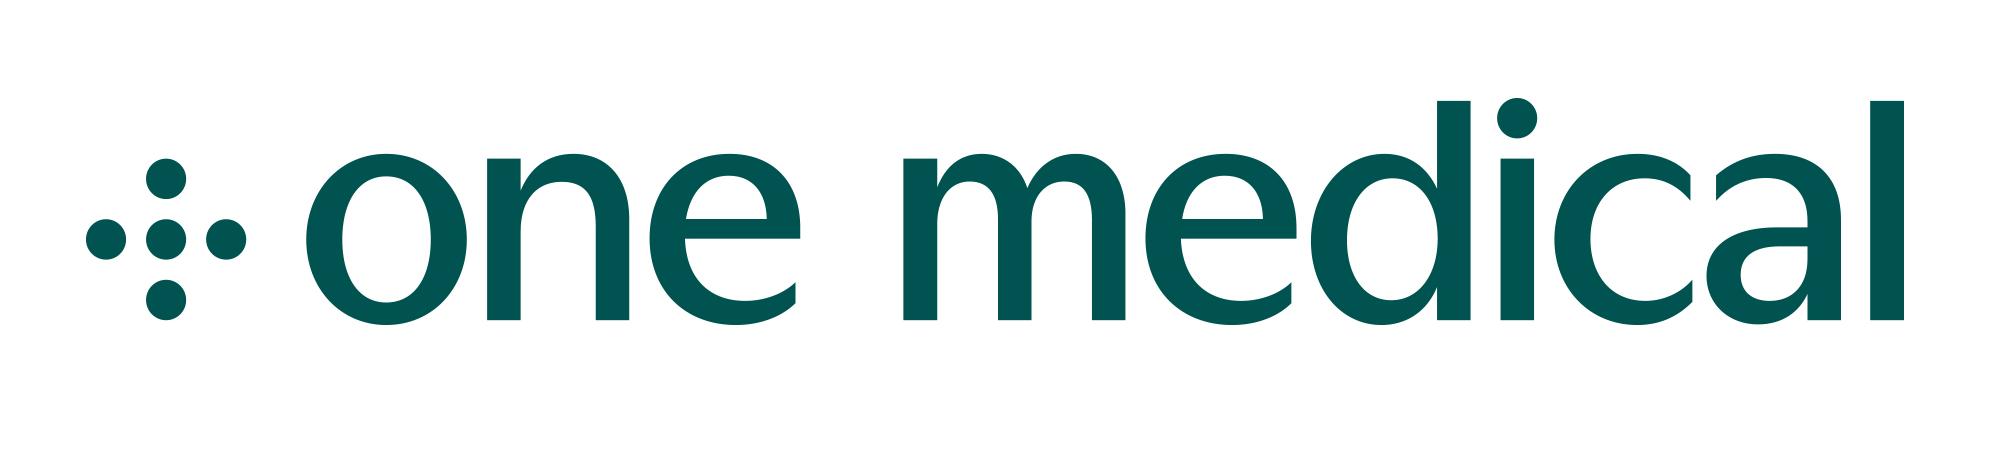 one_medical_logo (1).png